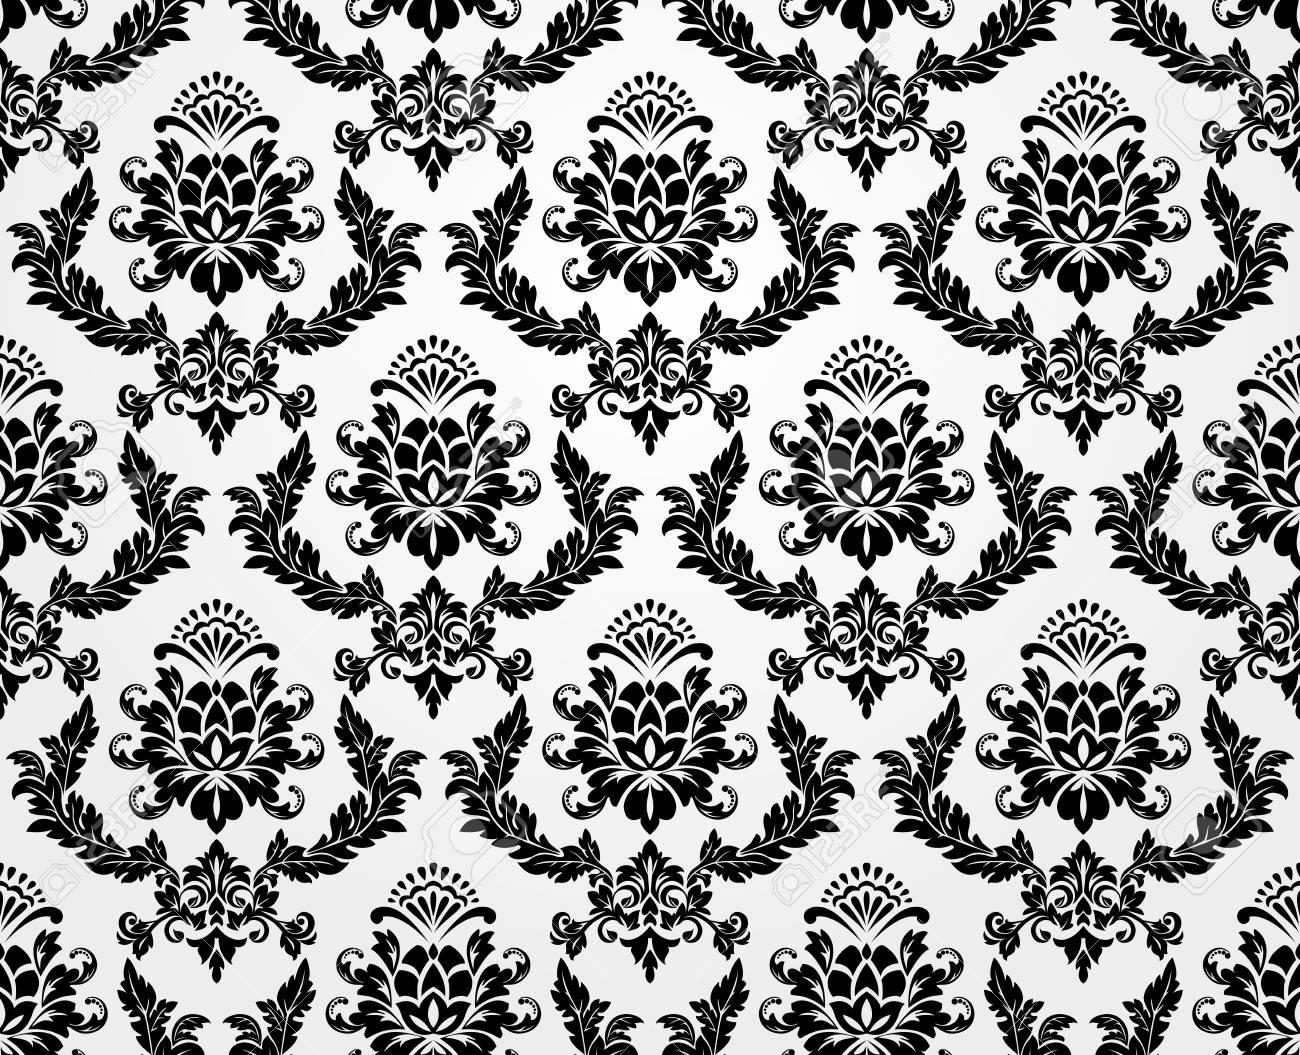 Floral Pattern Wallpaper Baroque Damask Seamless Vector Background